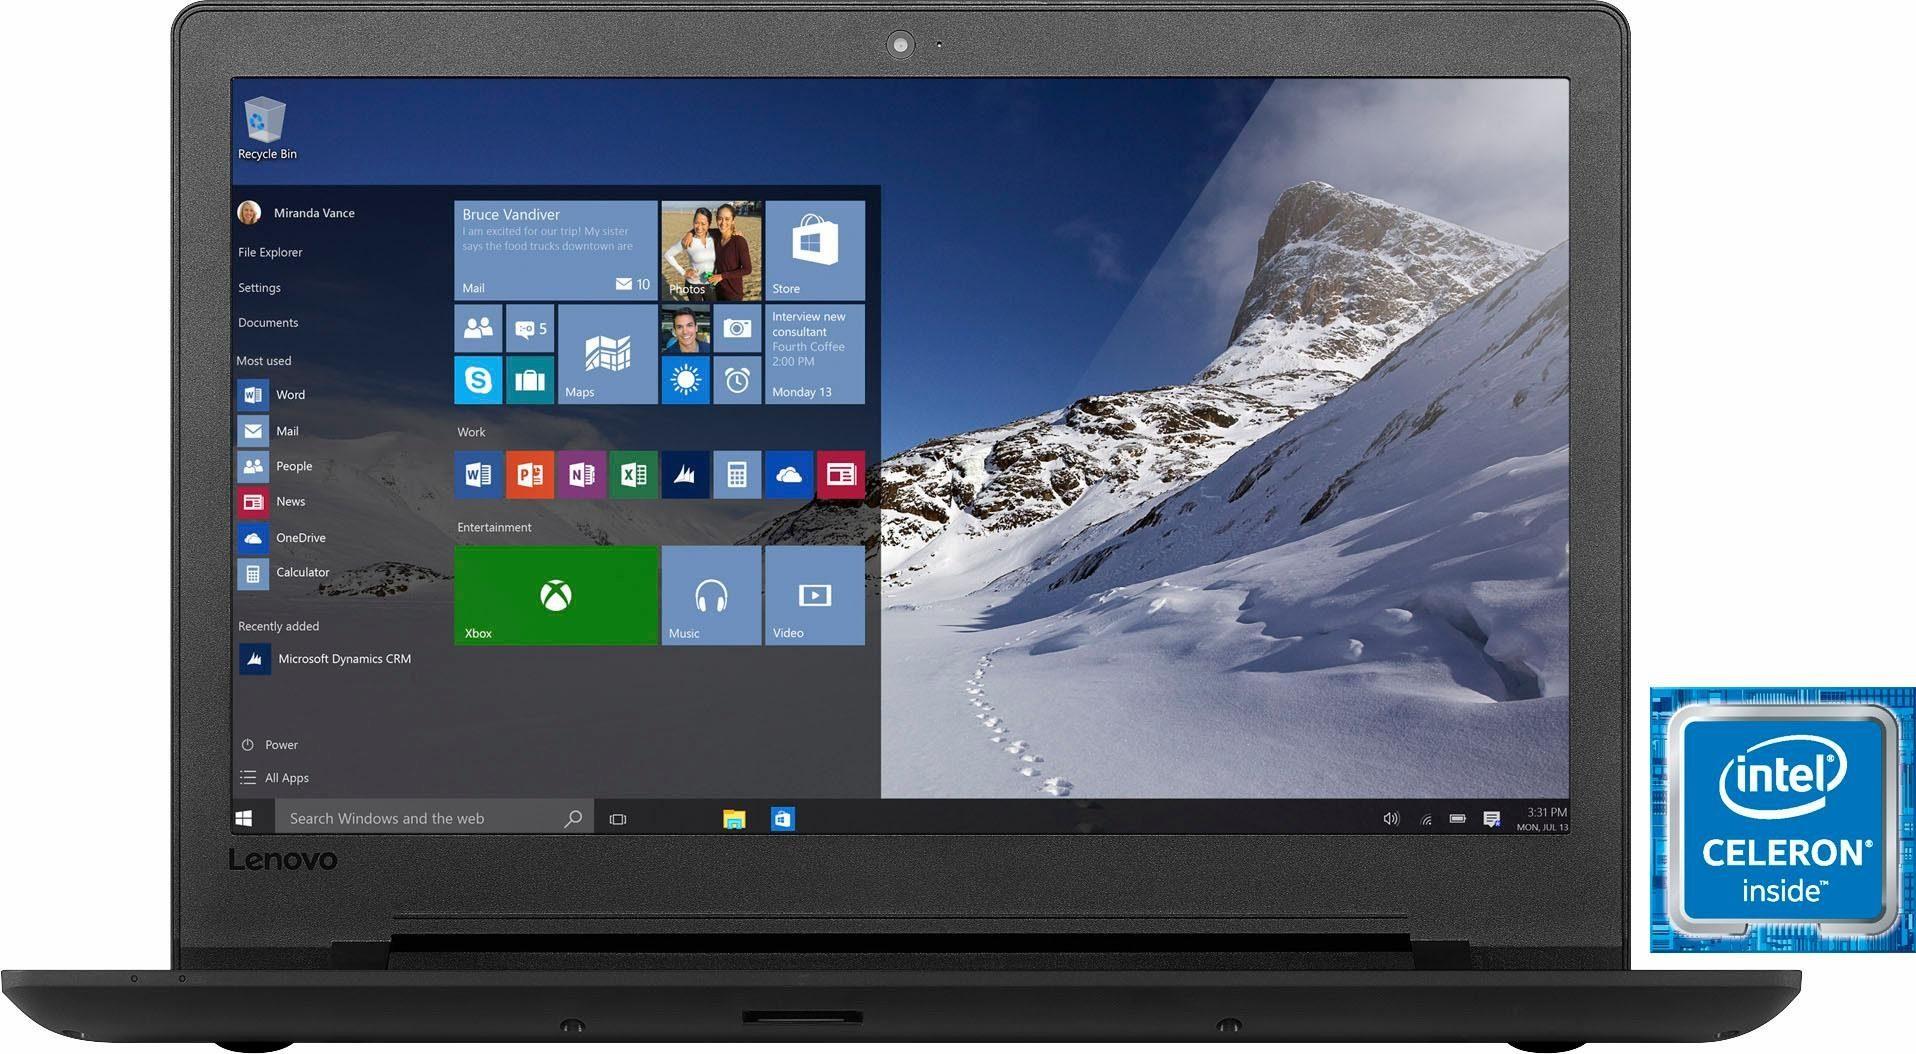 Lenovo IdeaPad 110-15IBR Notebook, Intel® Celeron™, 39,6 cm (15,6 Zoll), 1000 GB Speicher